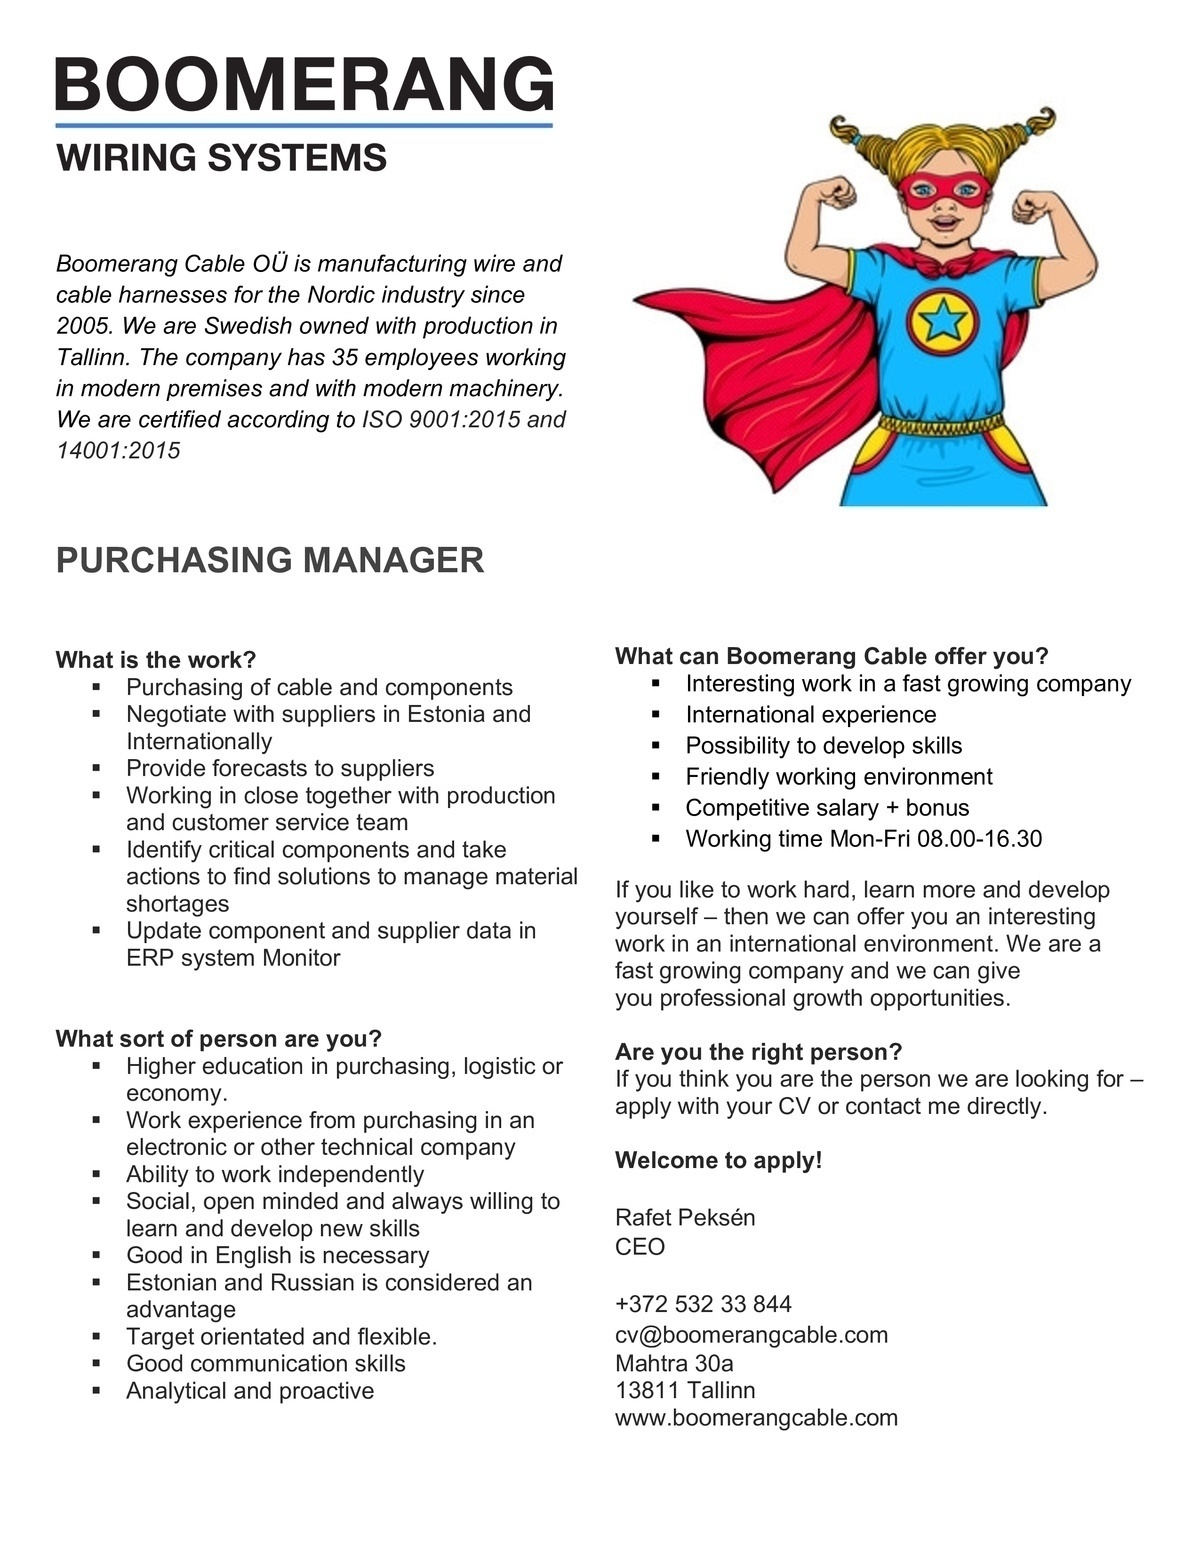 CV Keskus tööpakkumine Purchasing manager